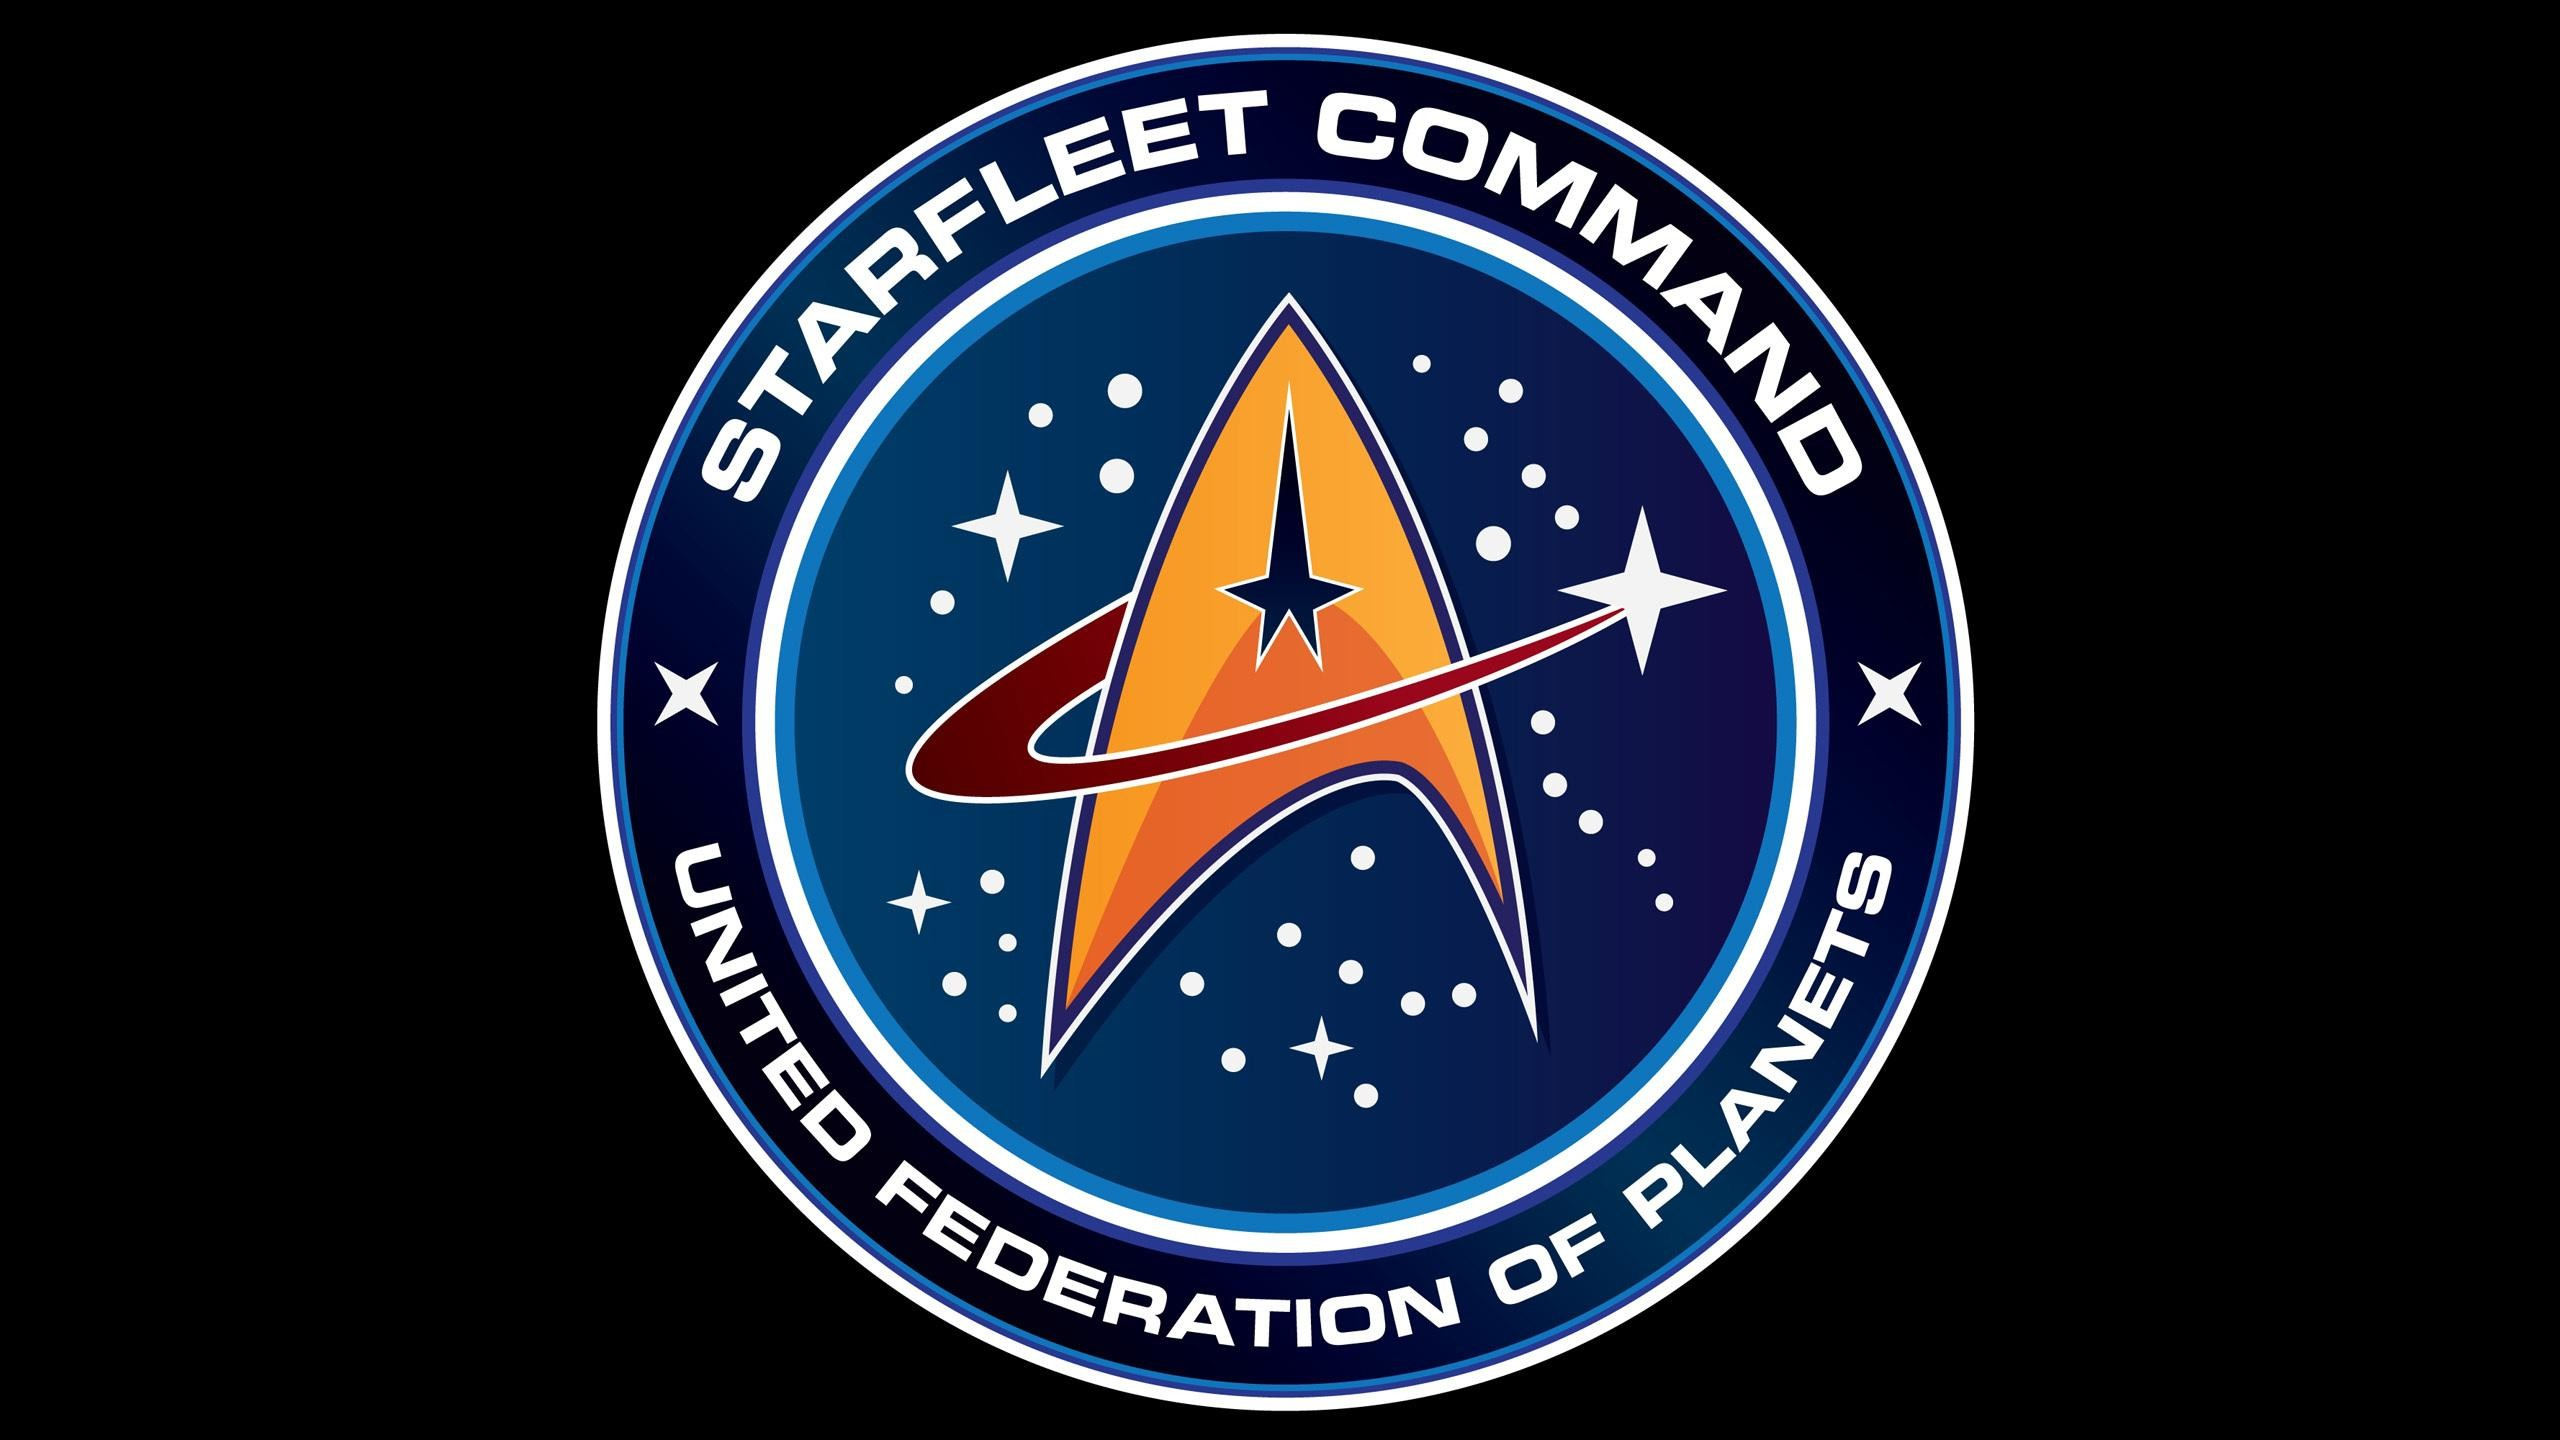 HD Starfleet Command in Star Trek Wallpaper